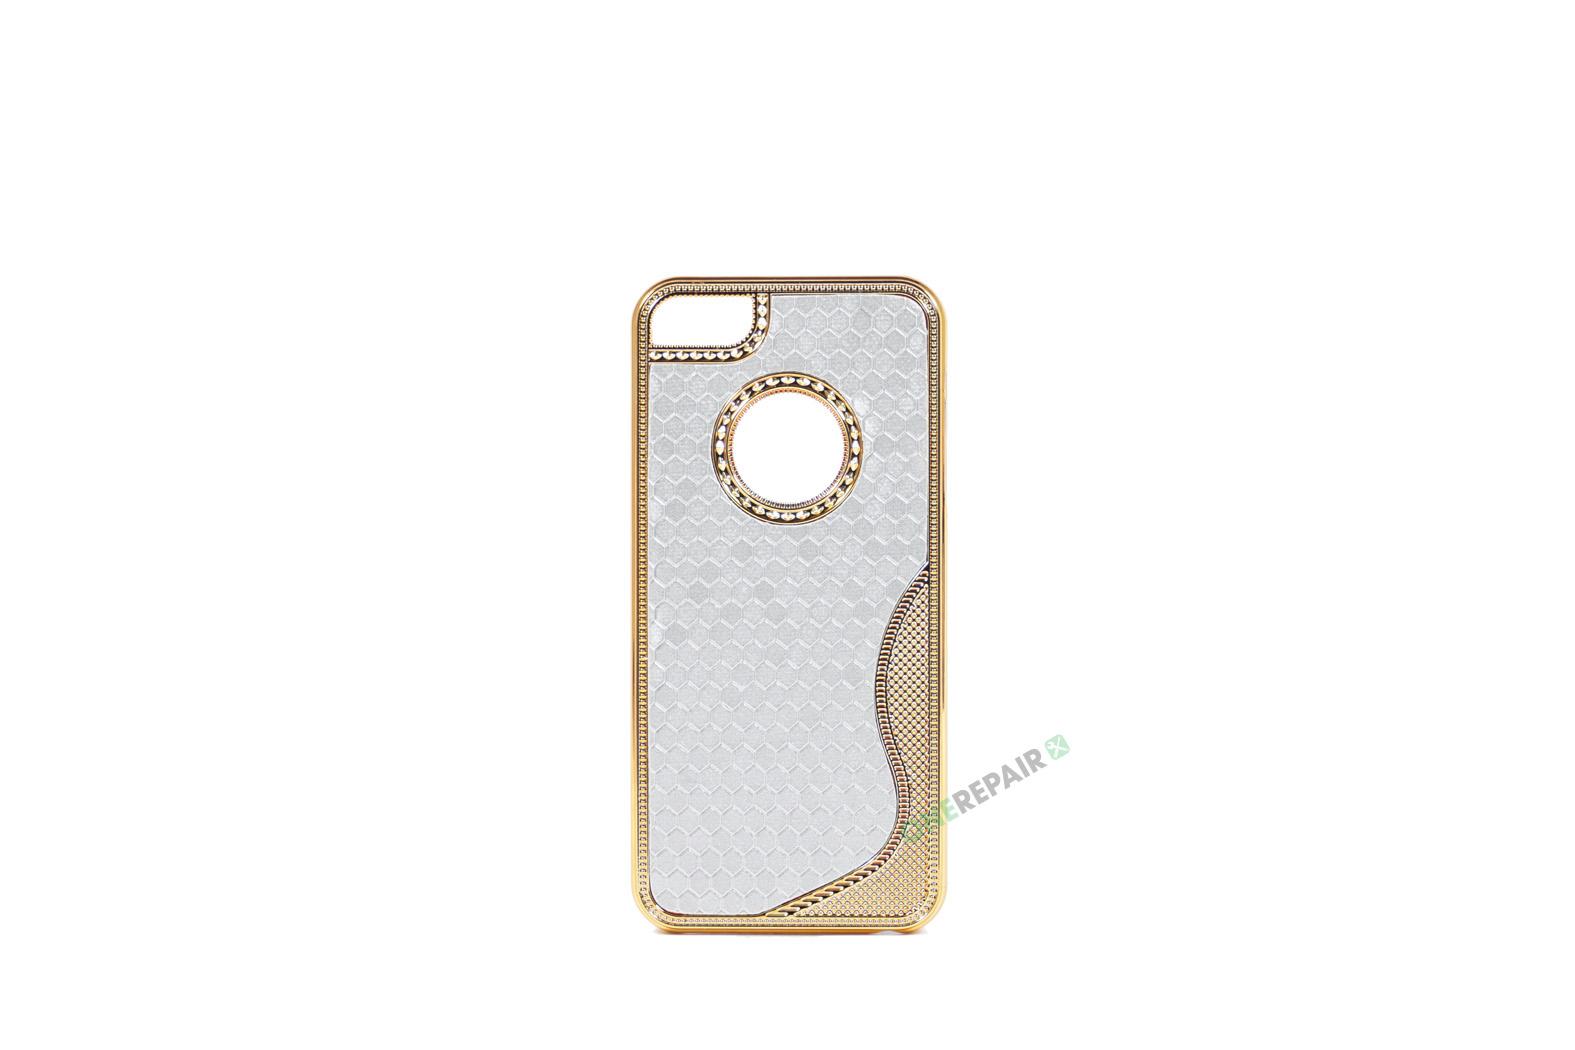 Billig iPhone 5 5S SE Plastik Apple Cover Bagcover Gummicover A1453 A1457 A1518 A1528 A1530 A1533 A1428 A1429 A1442 A1723 A1662 A1724 Shiny Glitter Glimmer